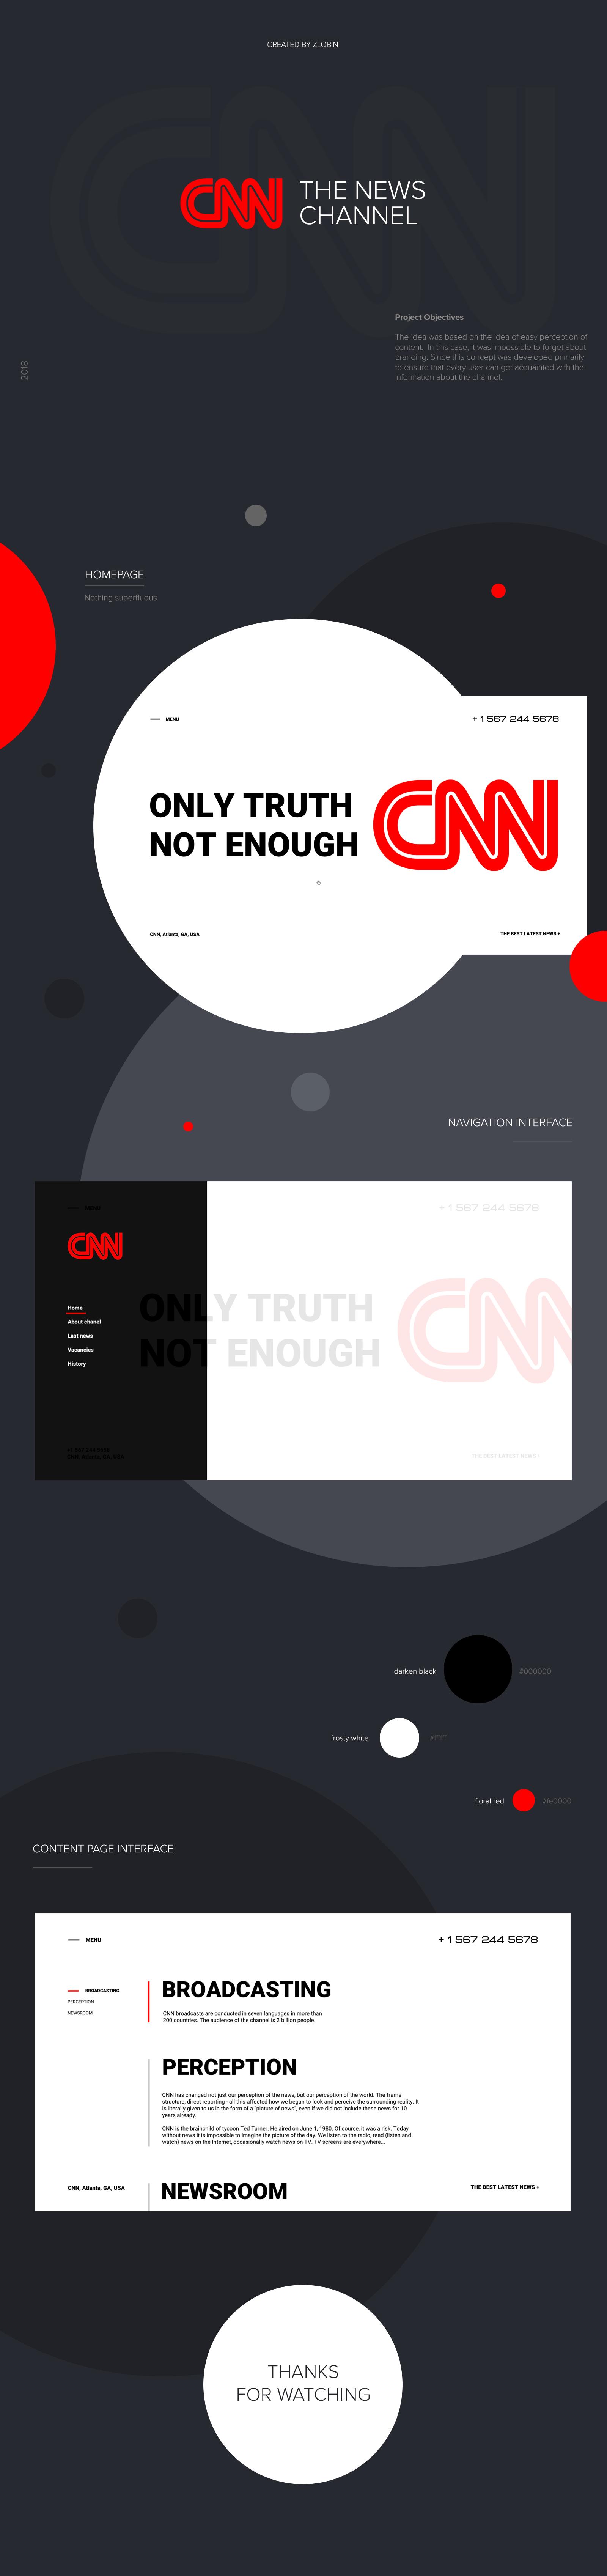 Дизайн сайта CNN Channel